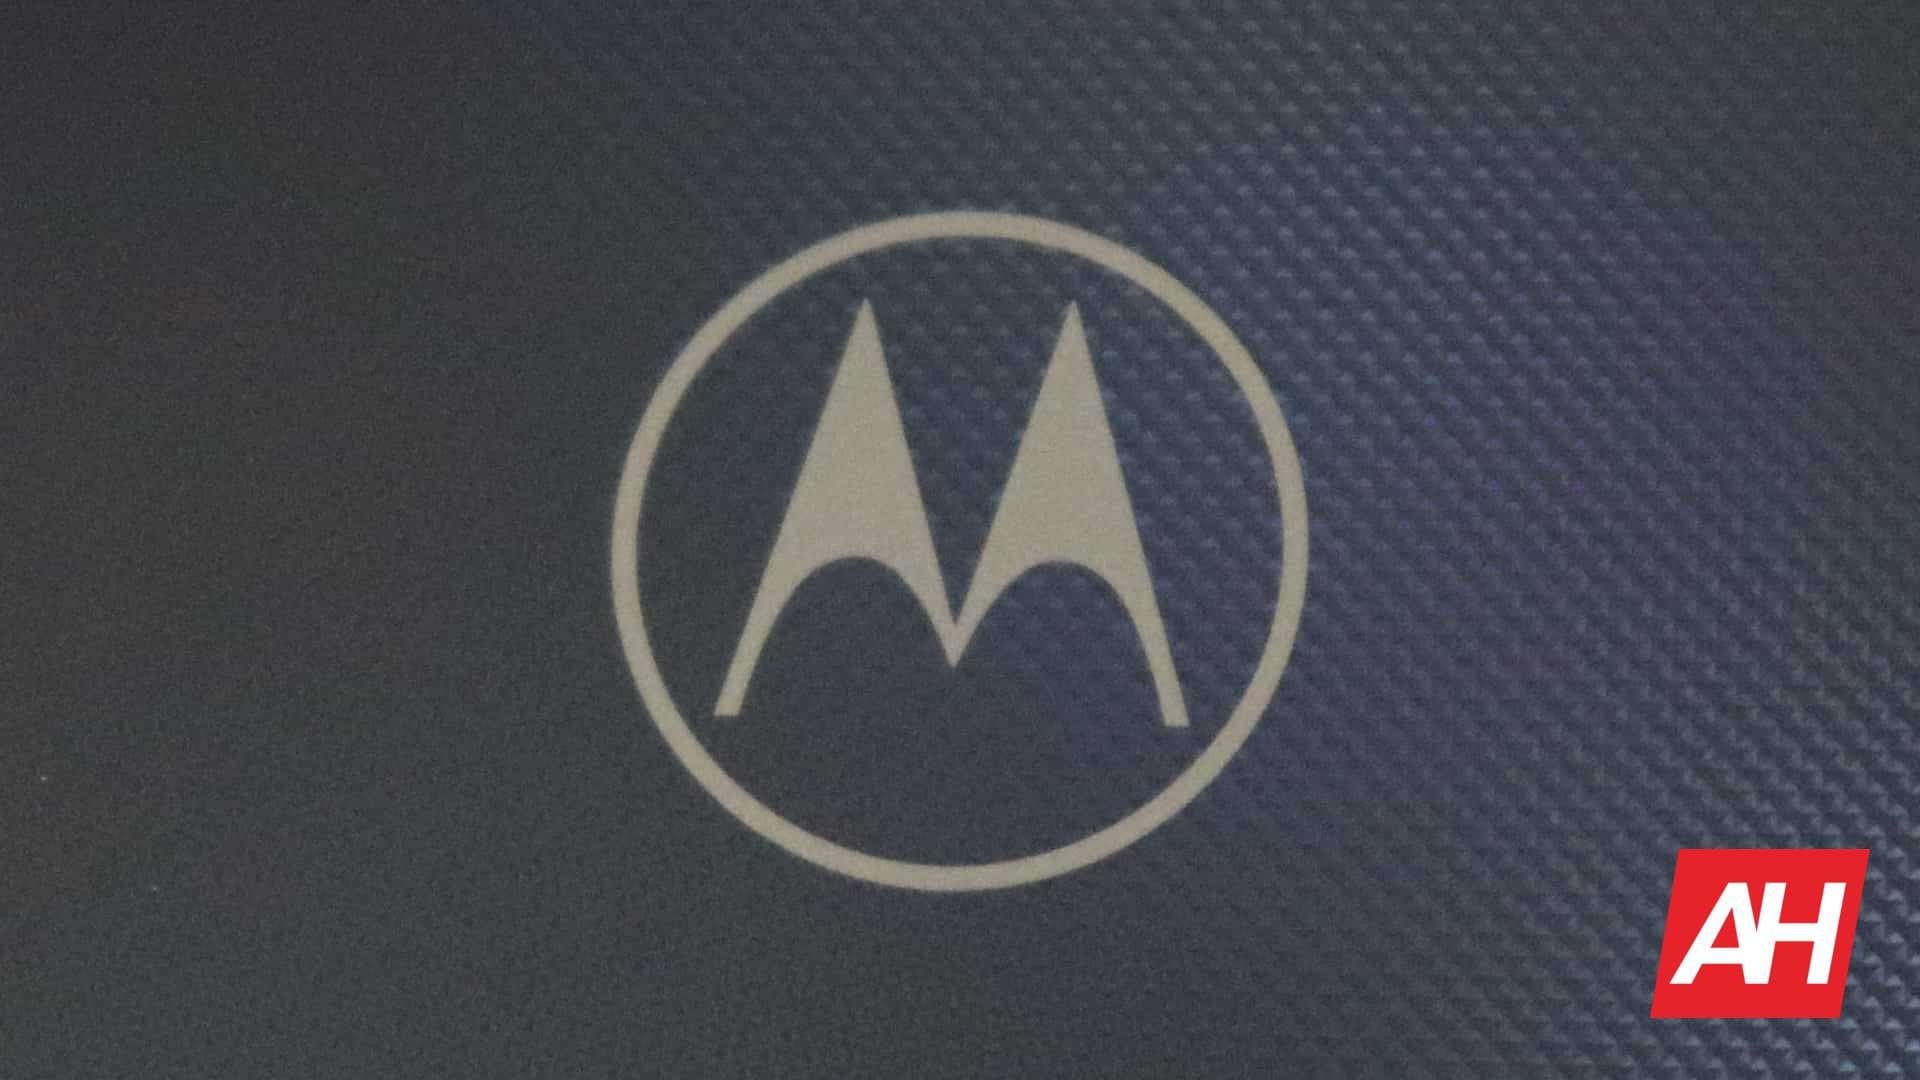 Motorola phone logo 01 DG AH 2020